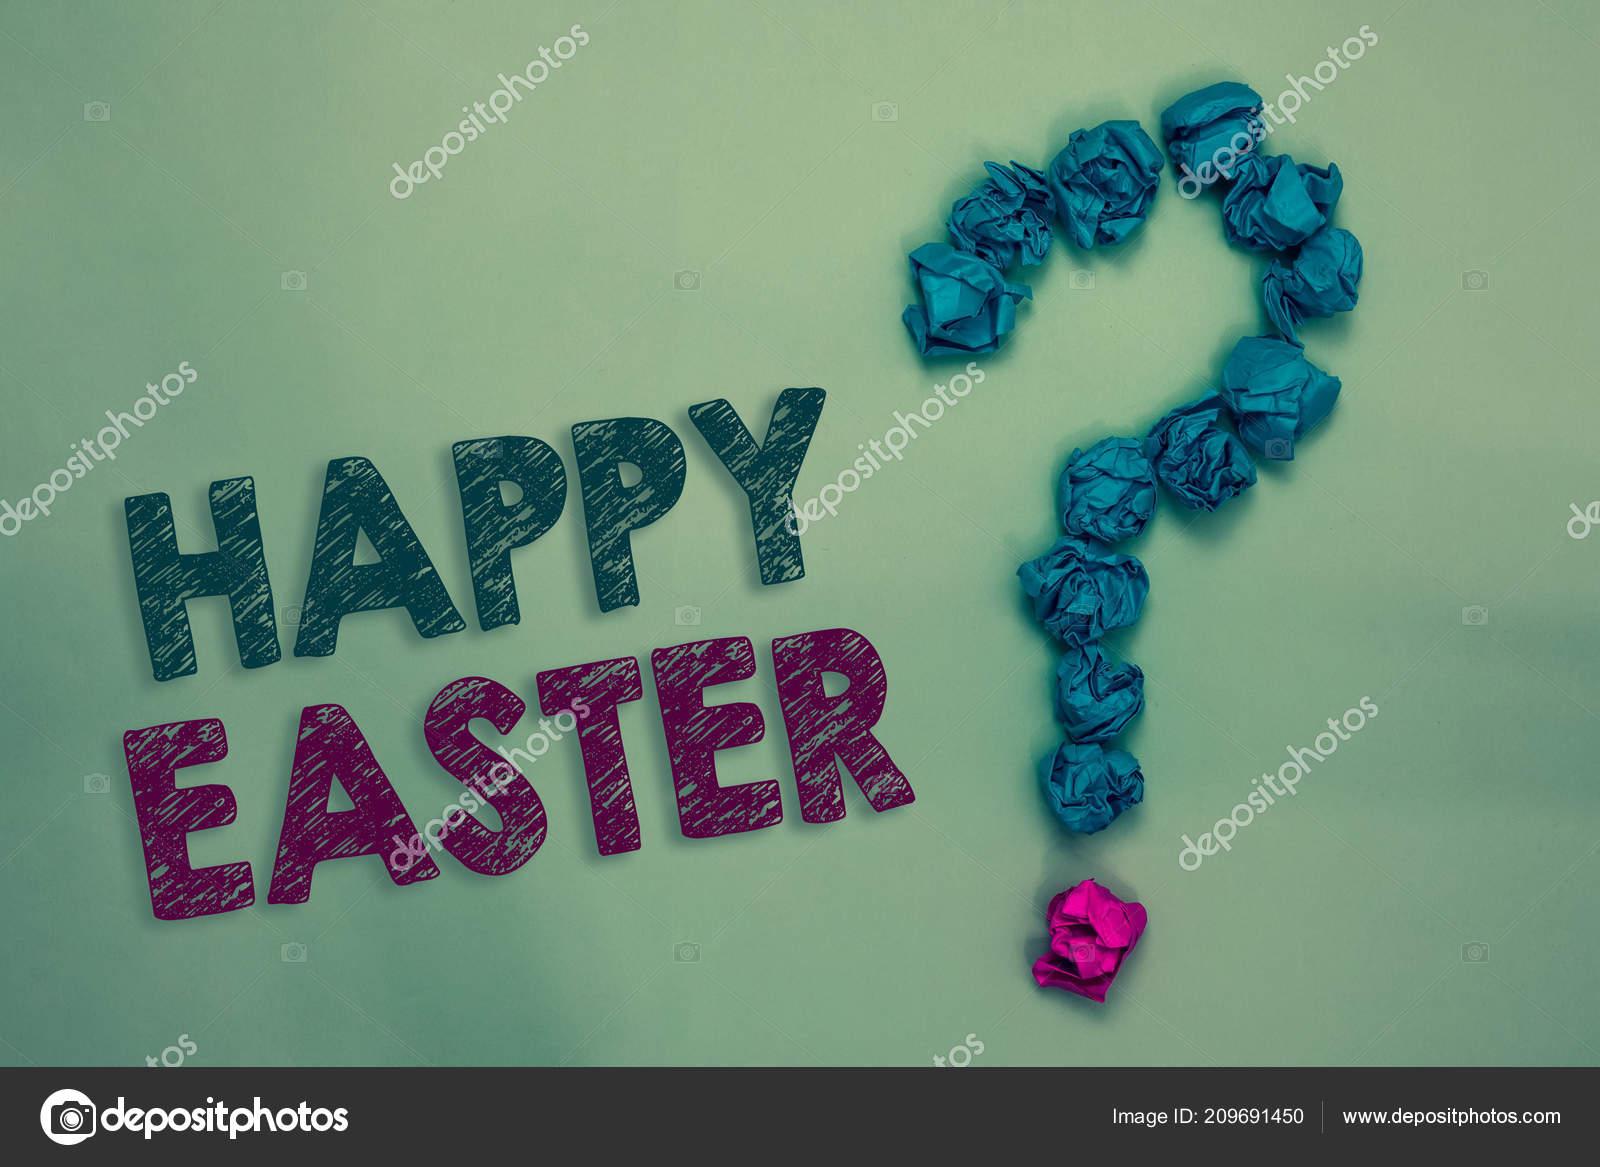 Muestra Texto Mostrando Felices Pascuas Fiesta Cristiana